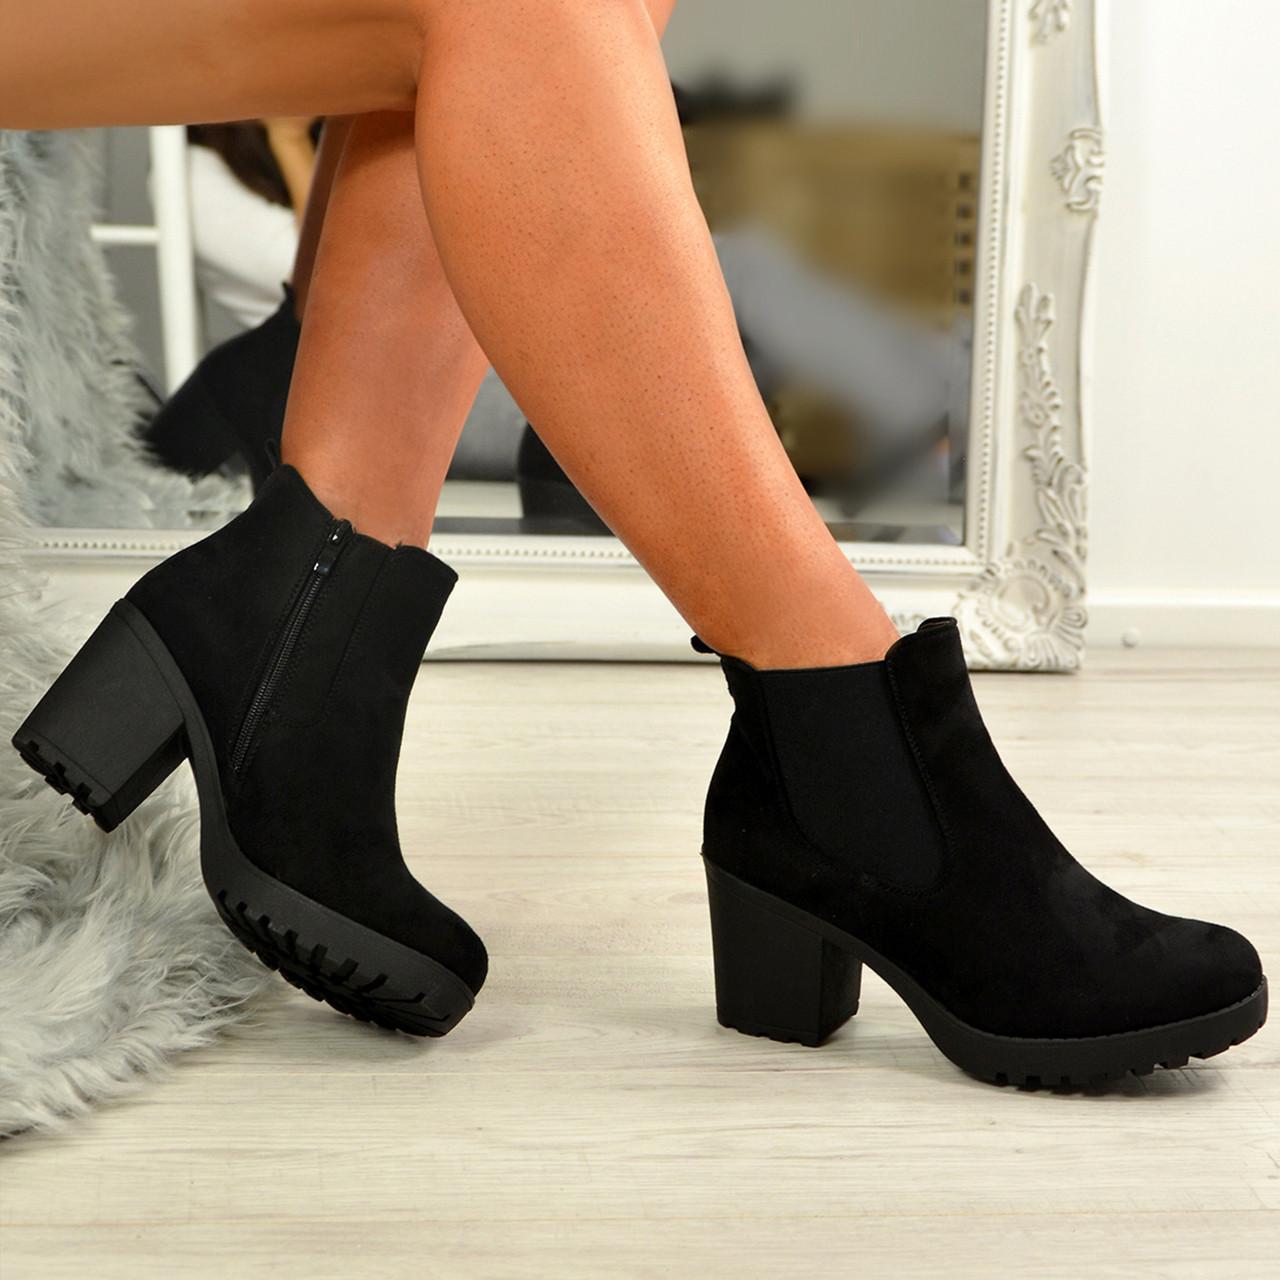 e47b8fe149d Keyla Black Suede Zip Ankle Boots